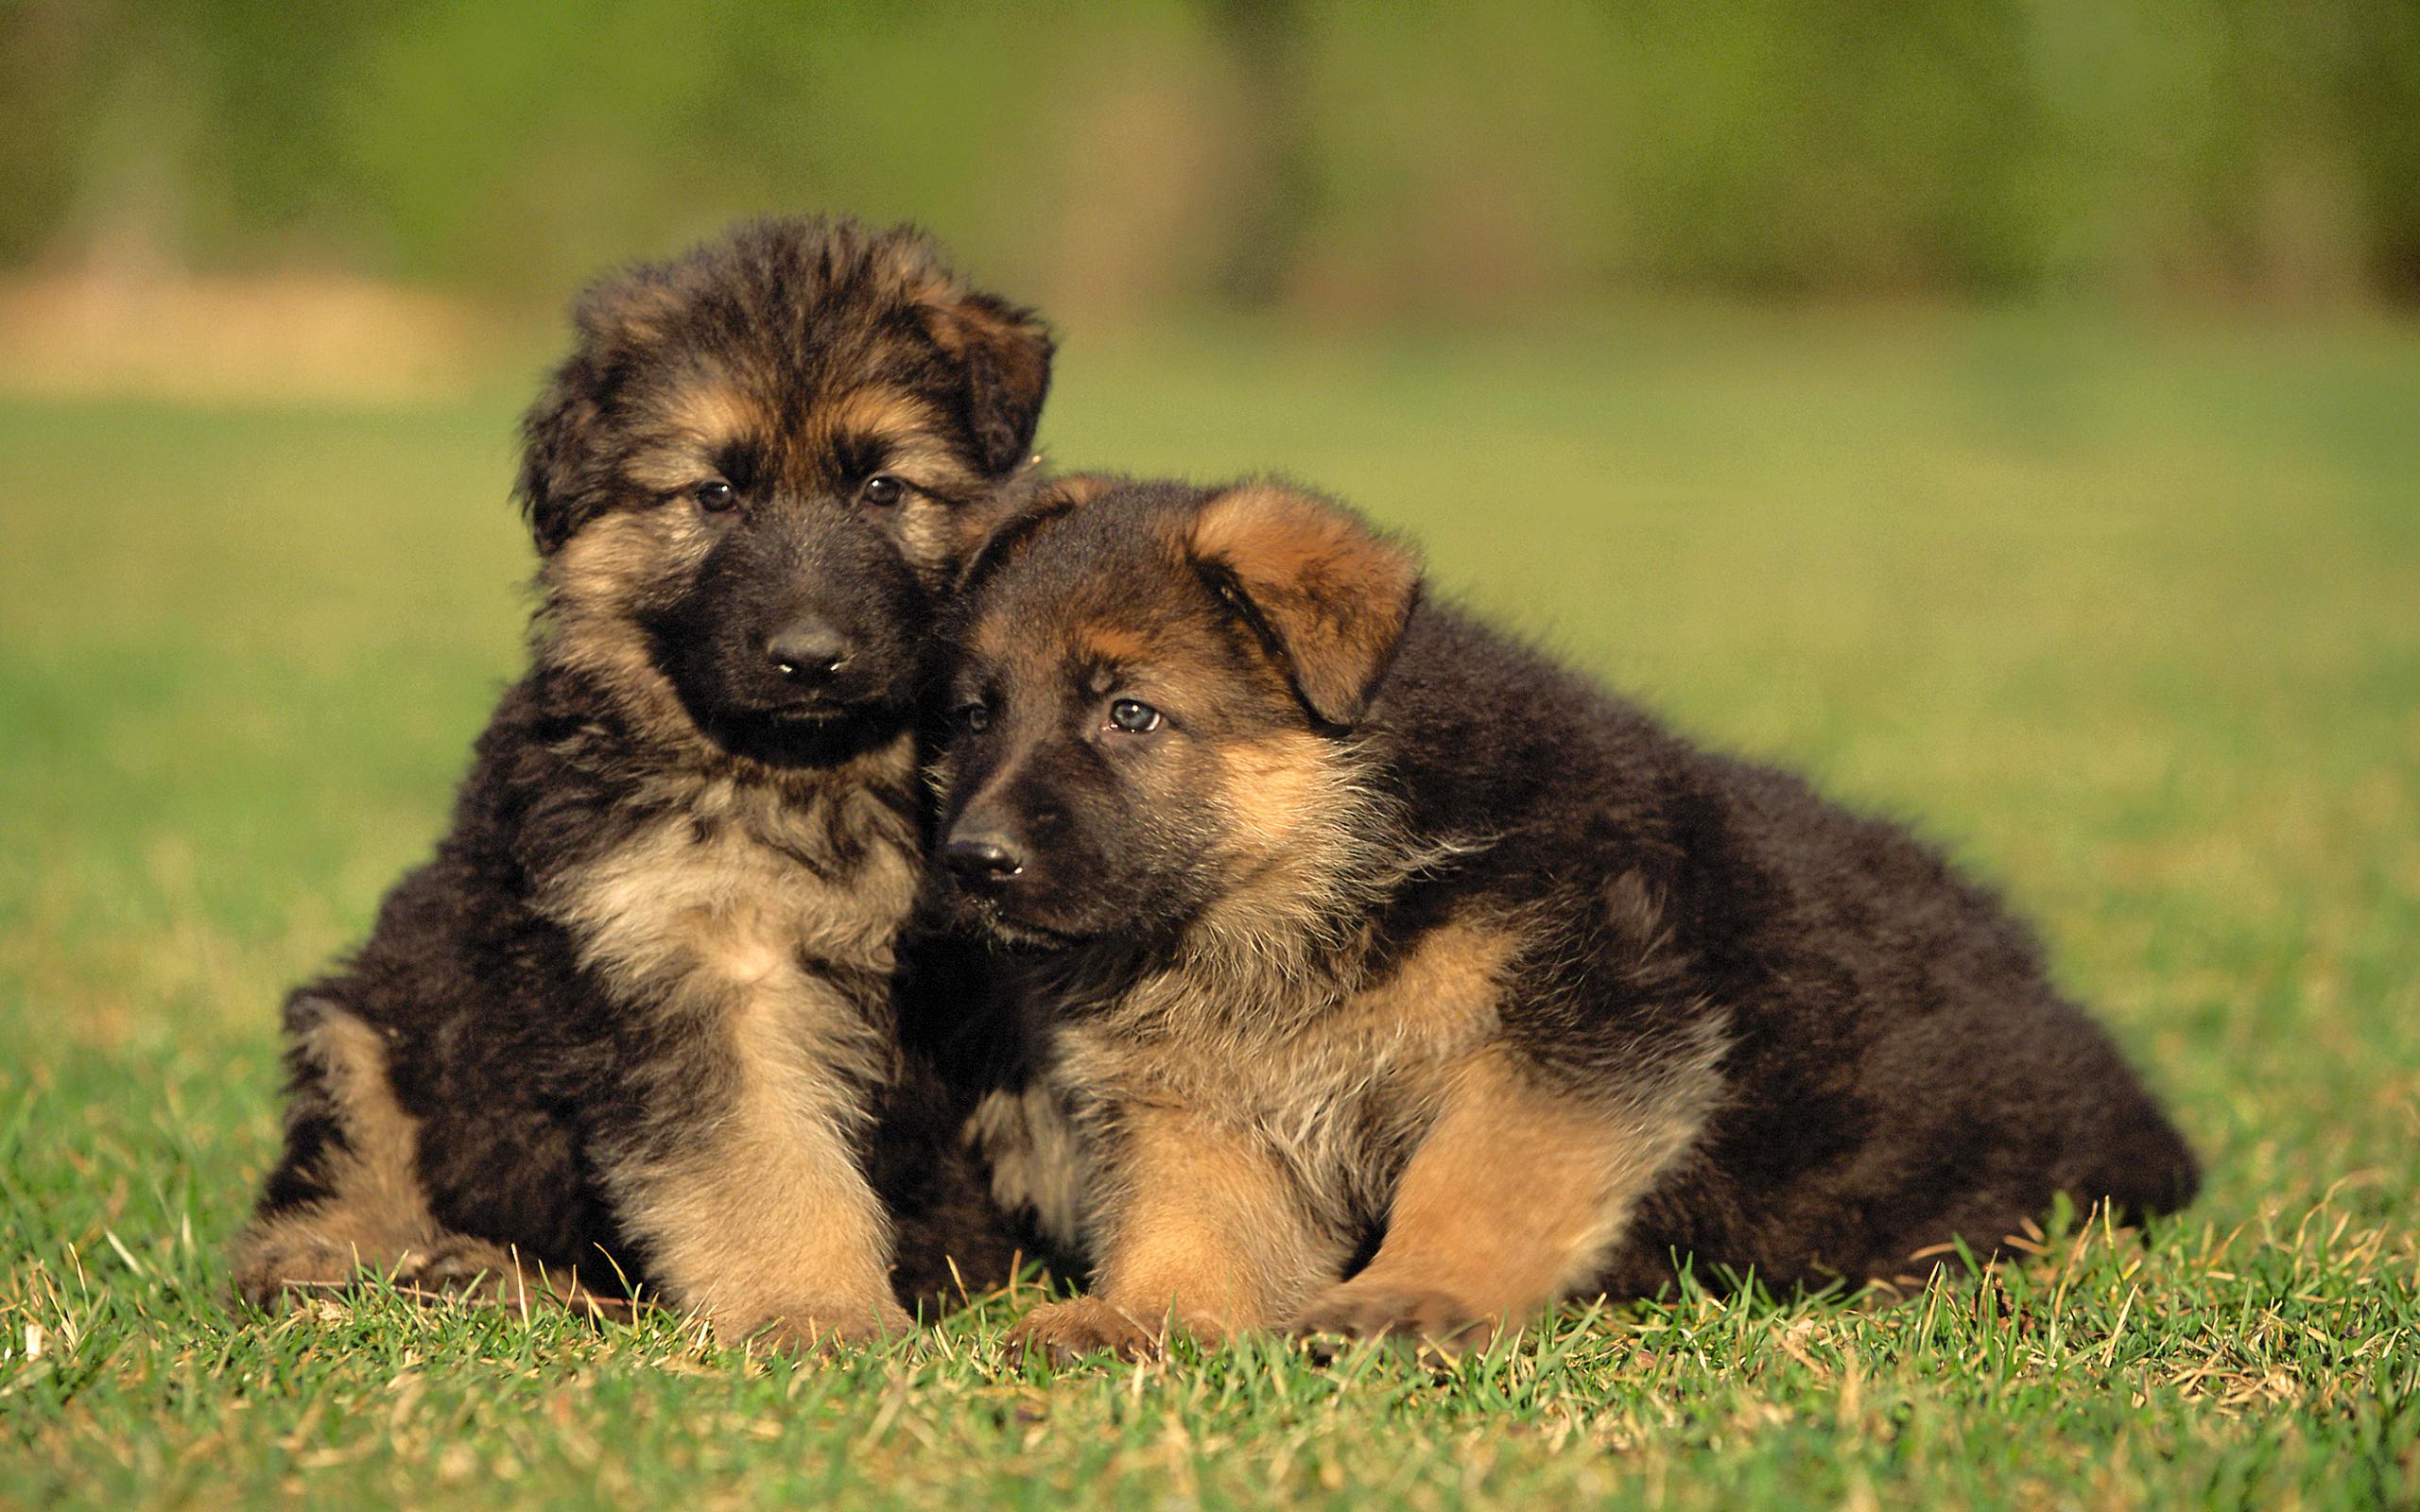 Adorable German Shepherd Puppies   Wallpaper High Definition High 2560x1600